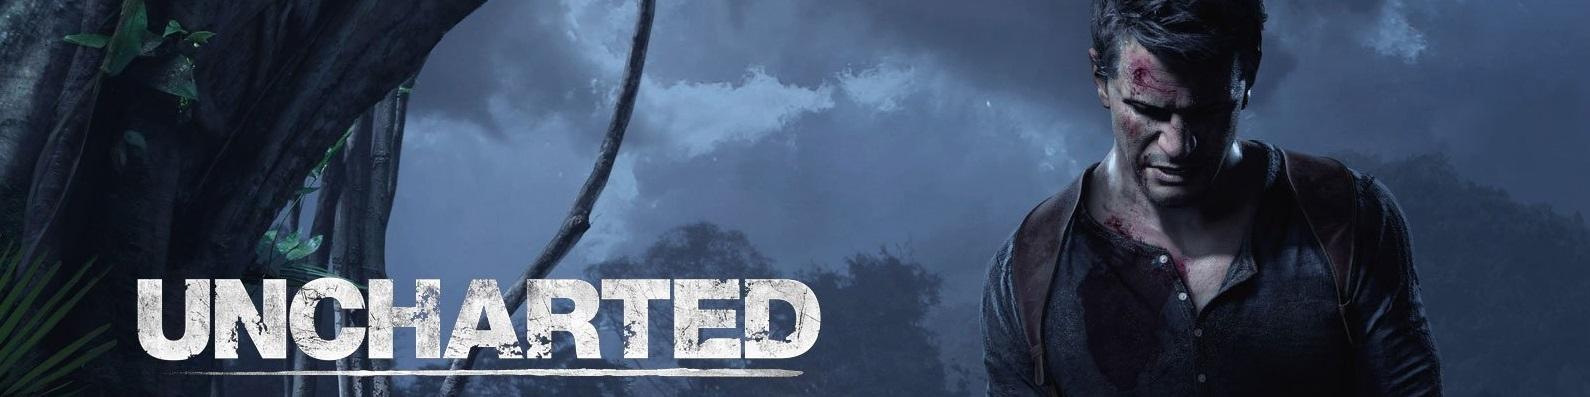 uncharted, uncharted 4, uncharted 5, uncharted the lost legacy, uncharted waters online, uncharted 3, uncharted 2